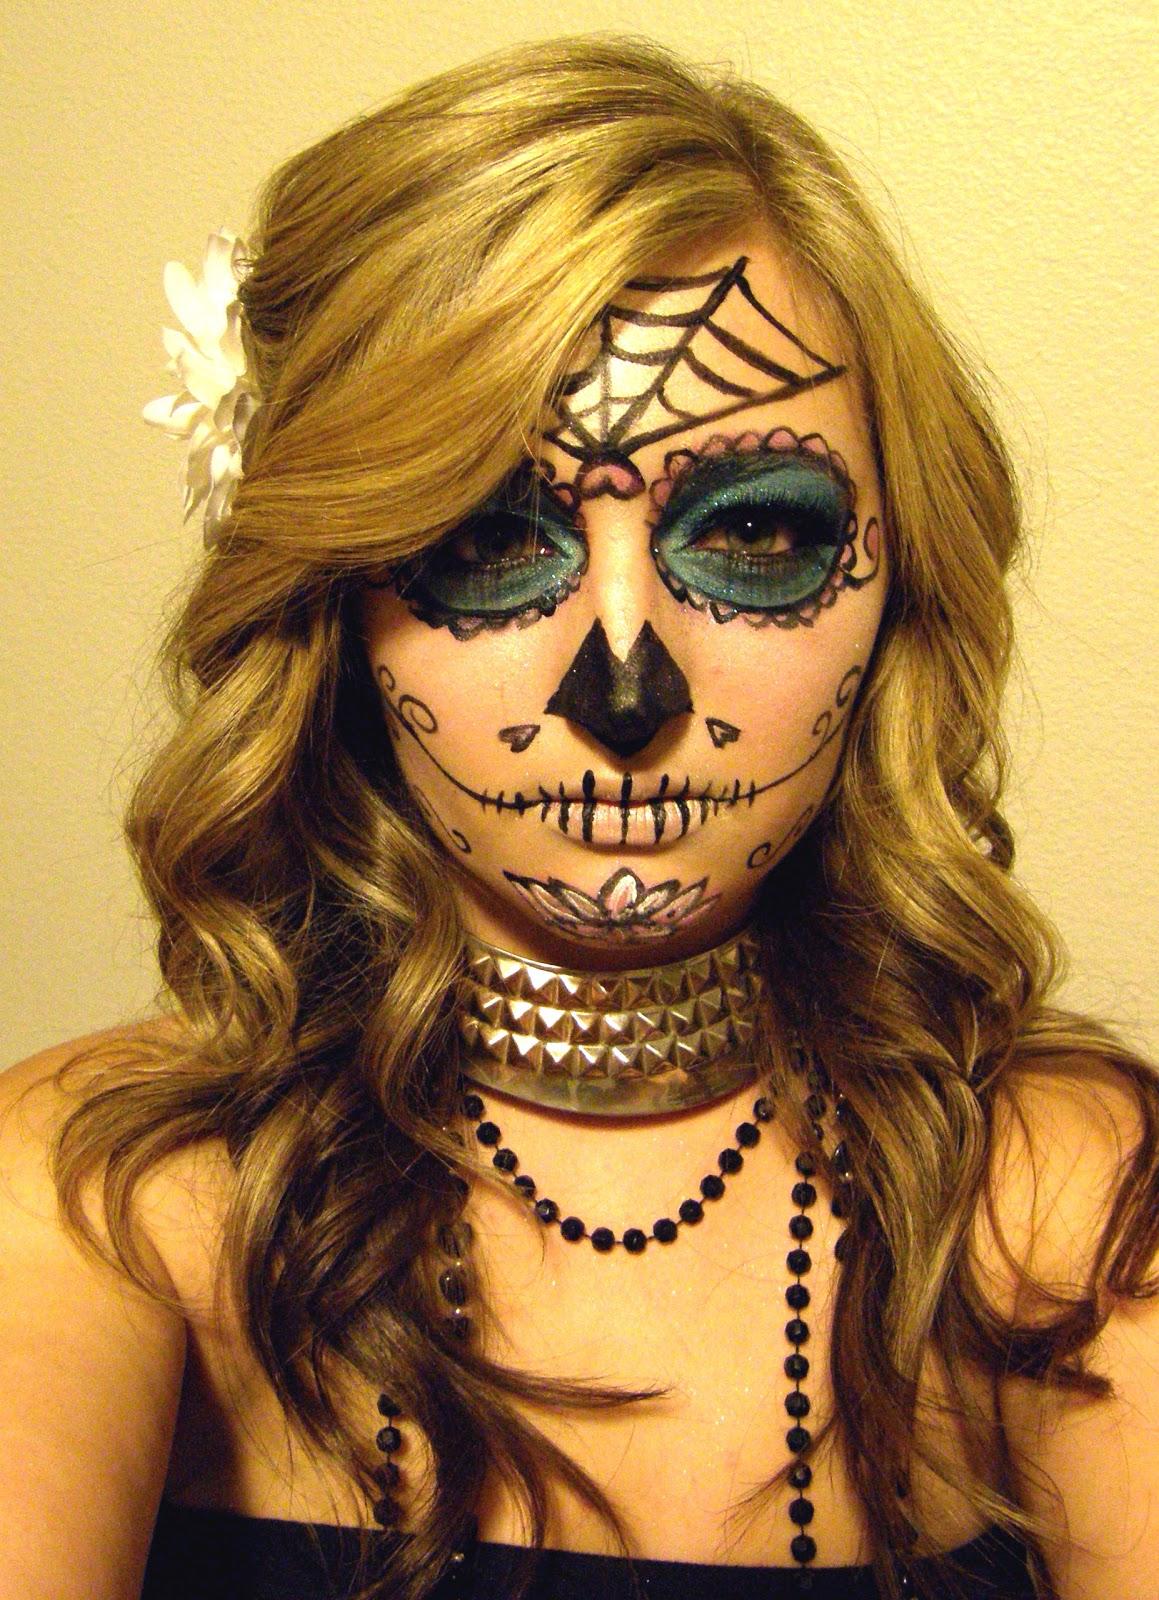 Can Can Dancer: Día de los Muertos Makeup (with Kiss Ever PRO Lash ... Sugar Skulls Face Paint Black And White